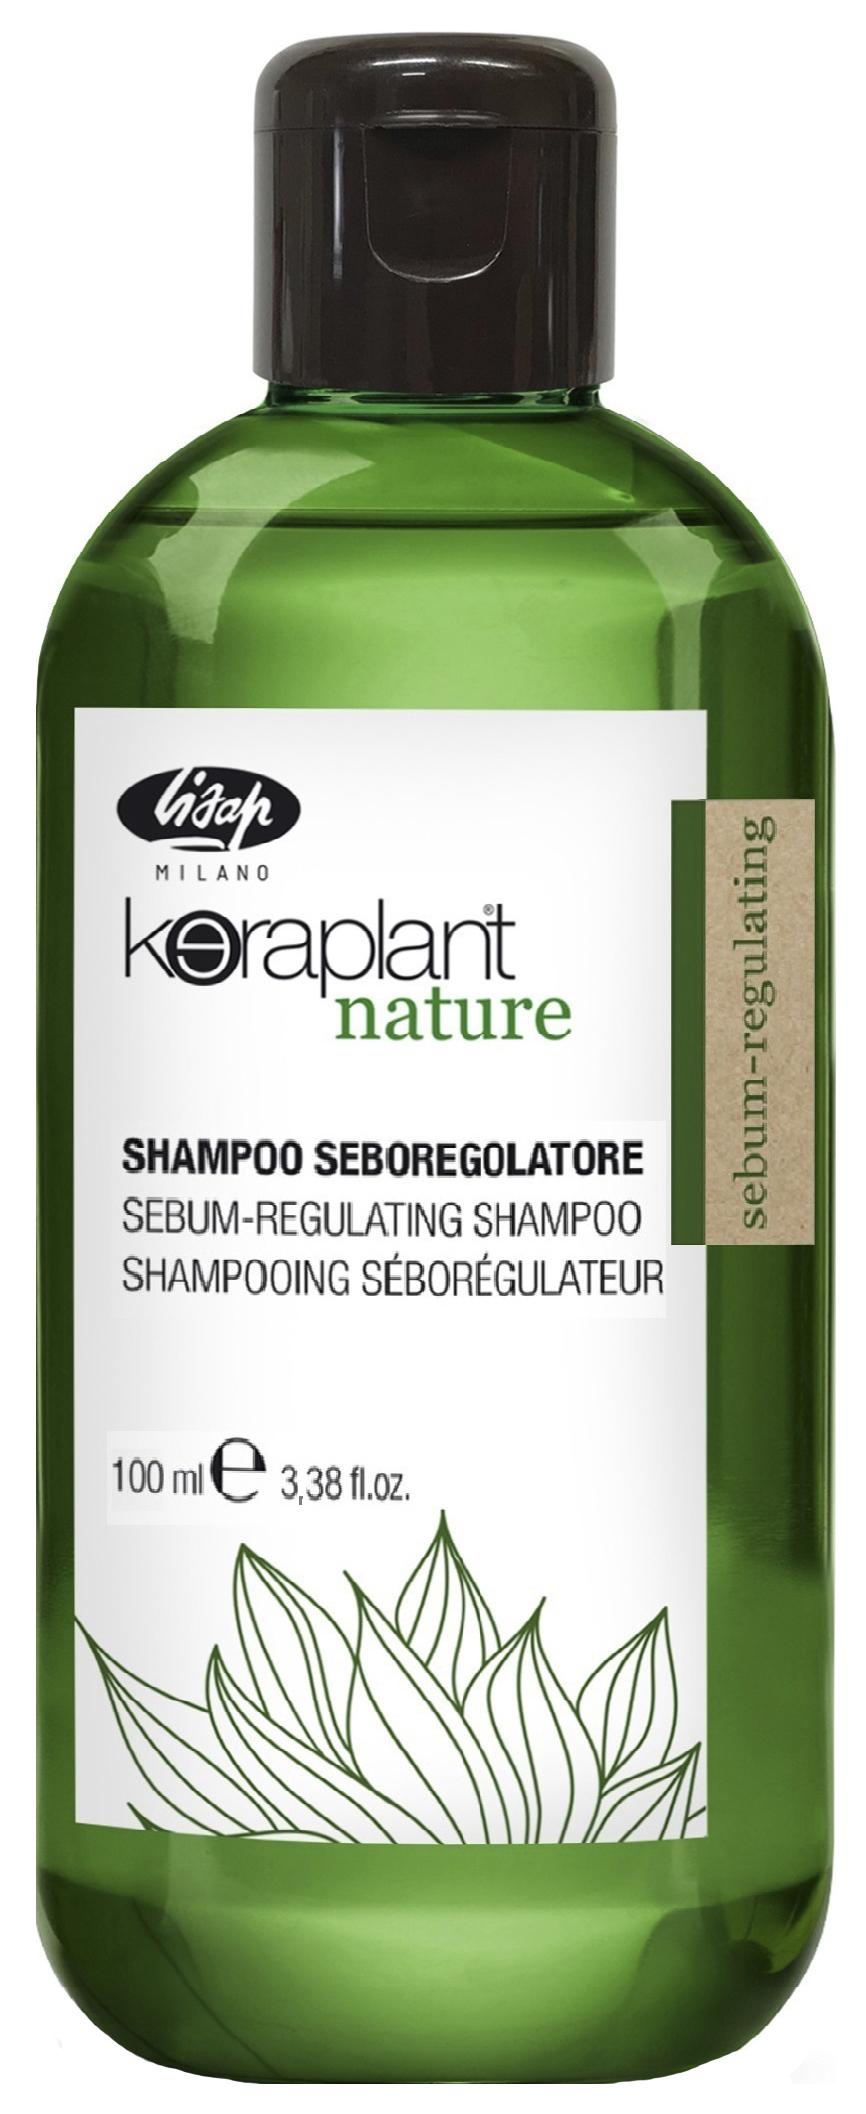 Шампунь себорегулирующий Lisap Milano Keraplant Nature Sebum-Regulating Shampoo 100 мл